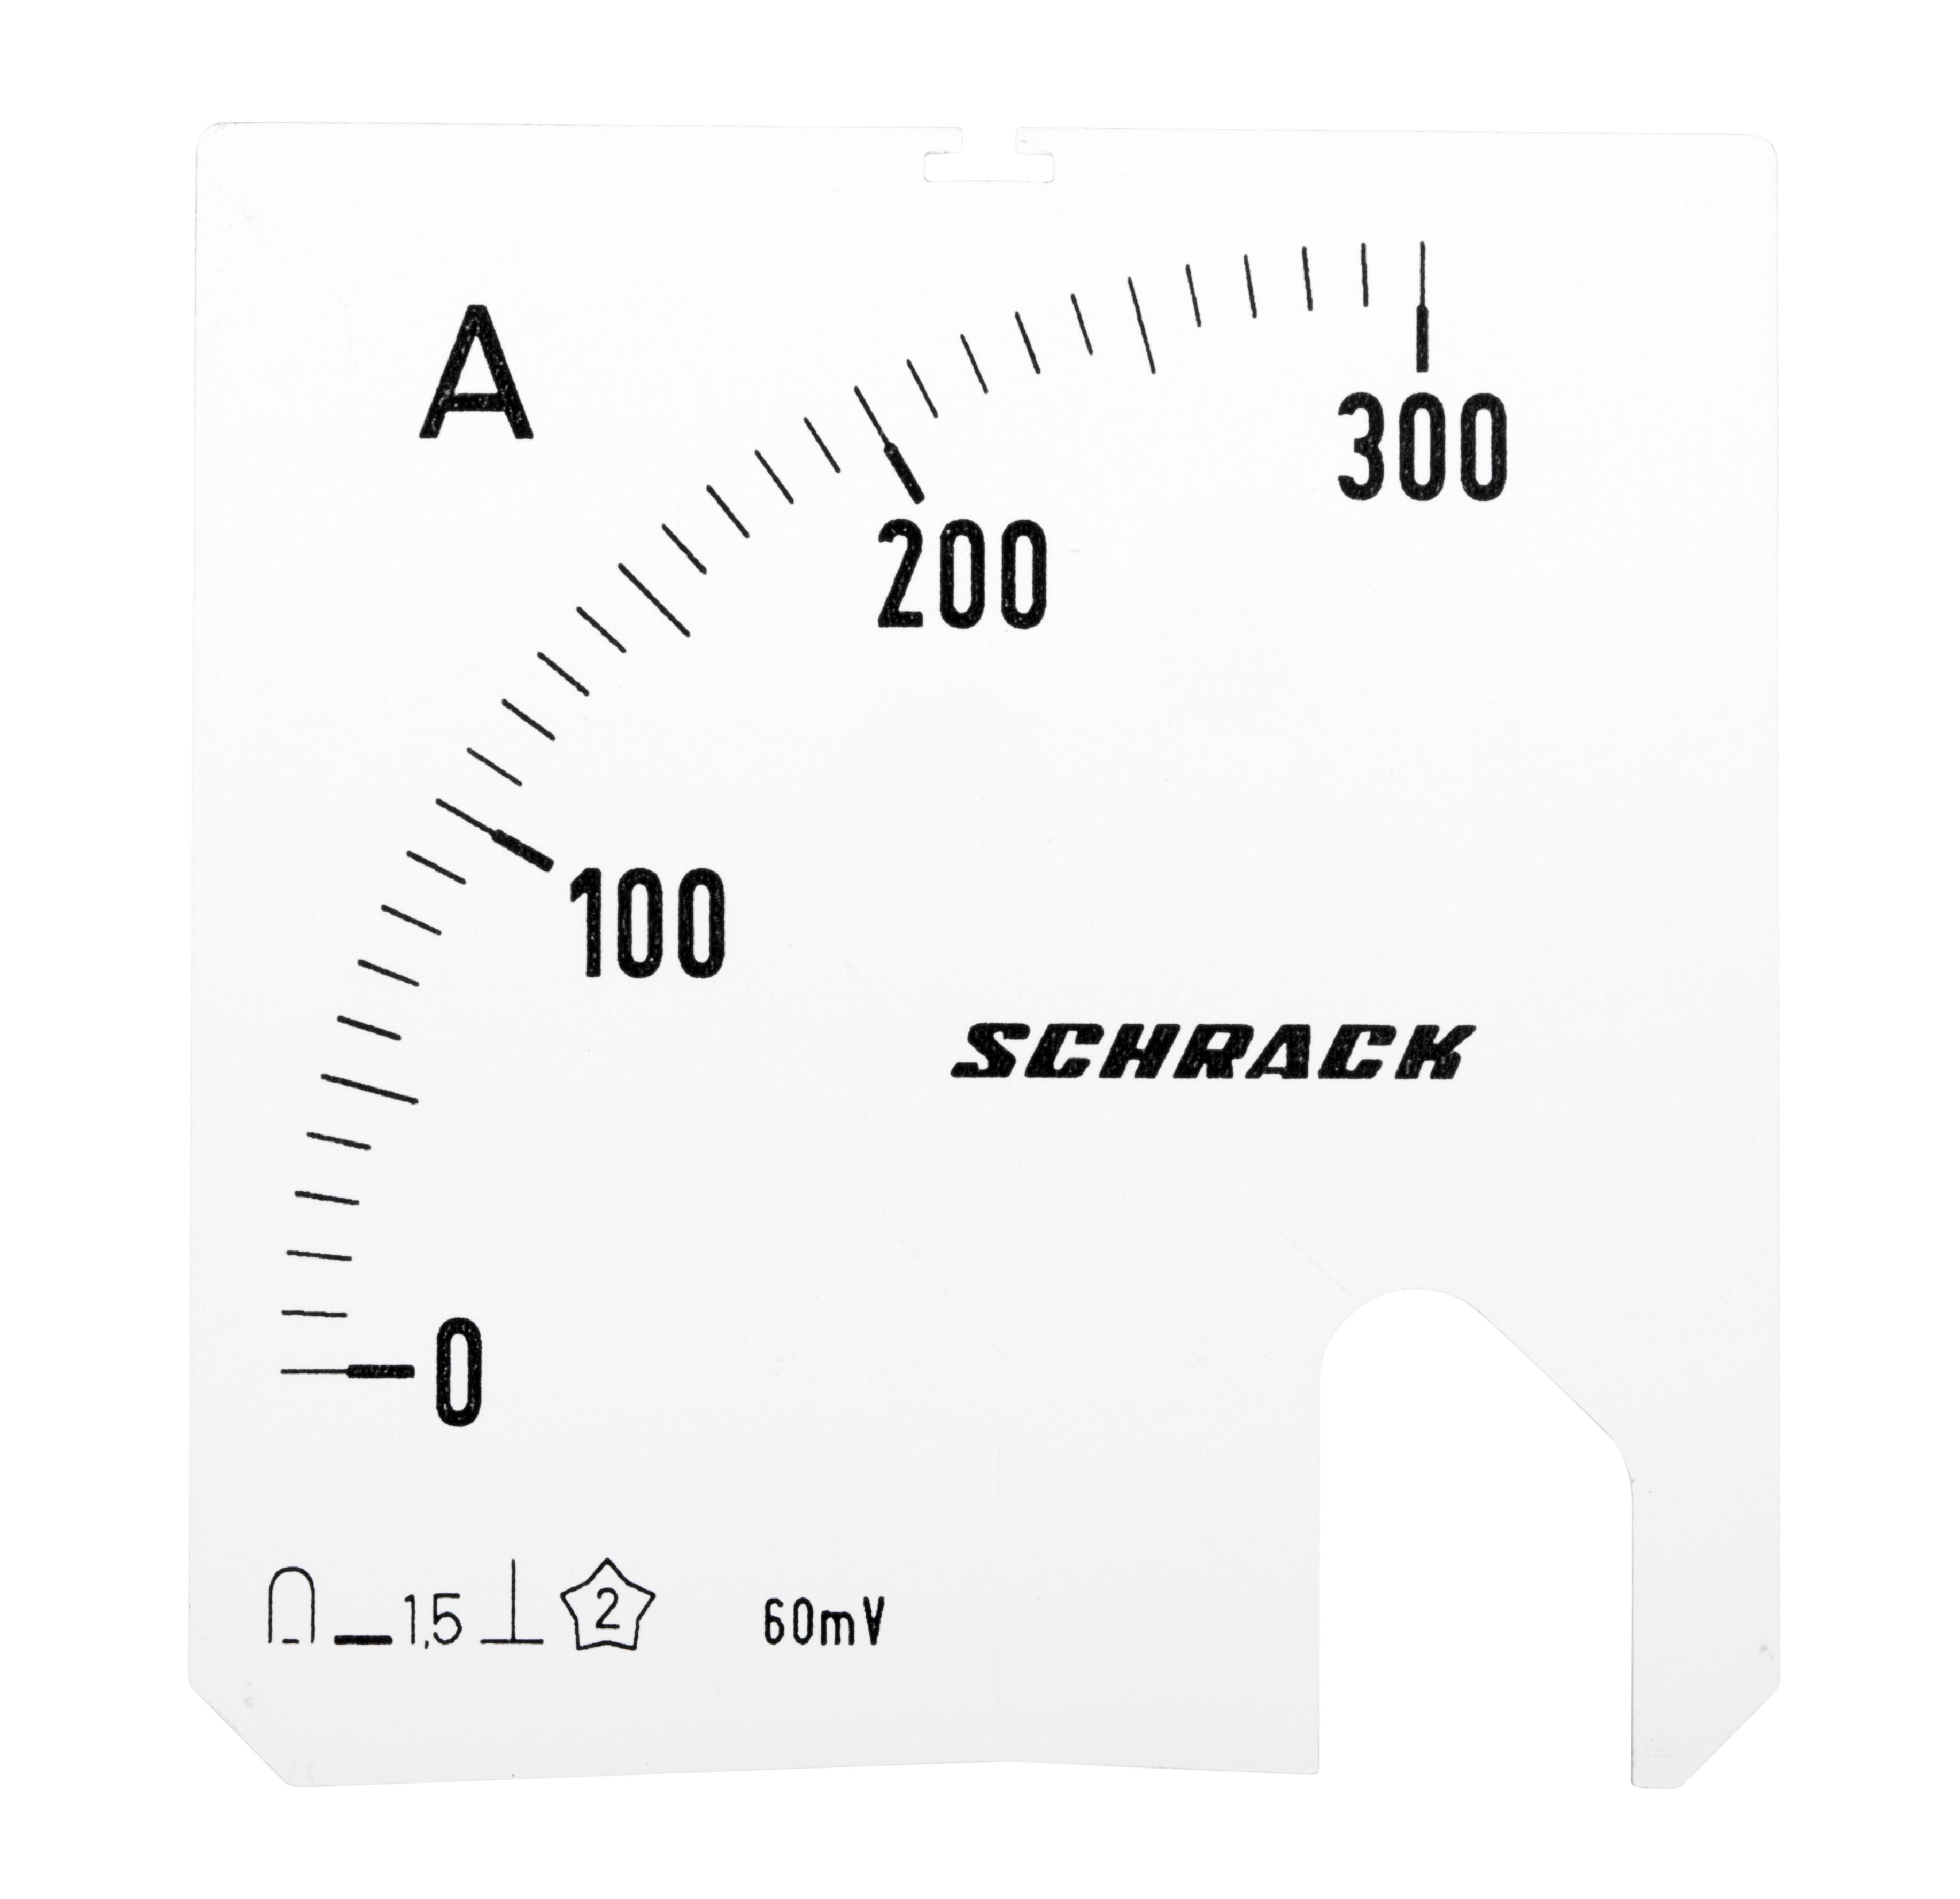 1 Stk Wechselskala, 72x72mm, 300A DC MGS17300-A